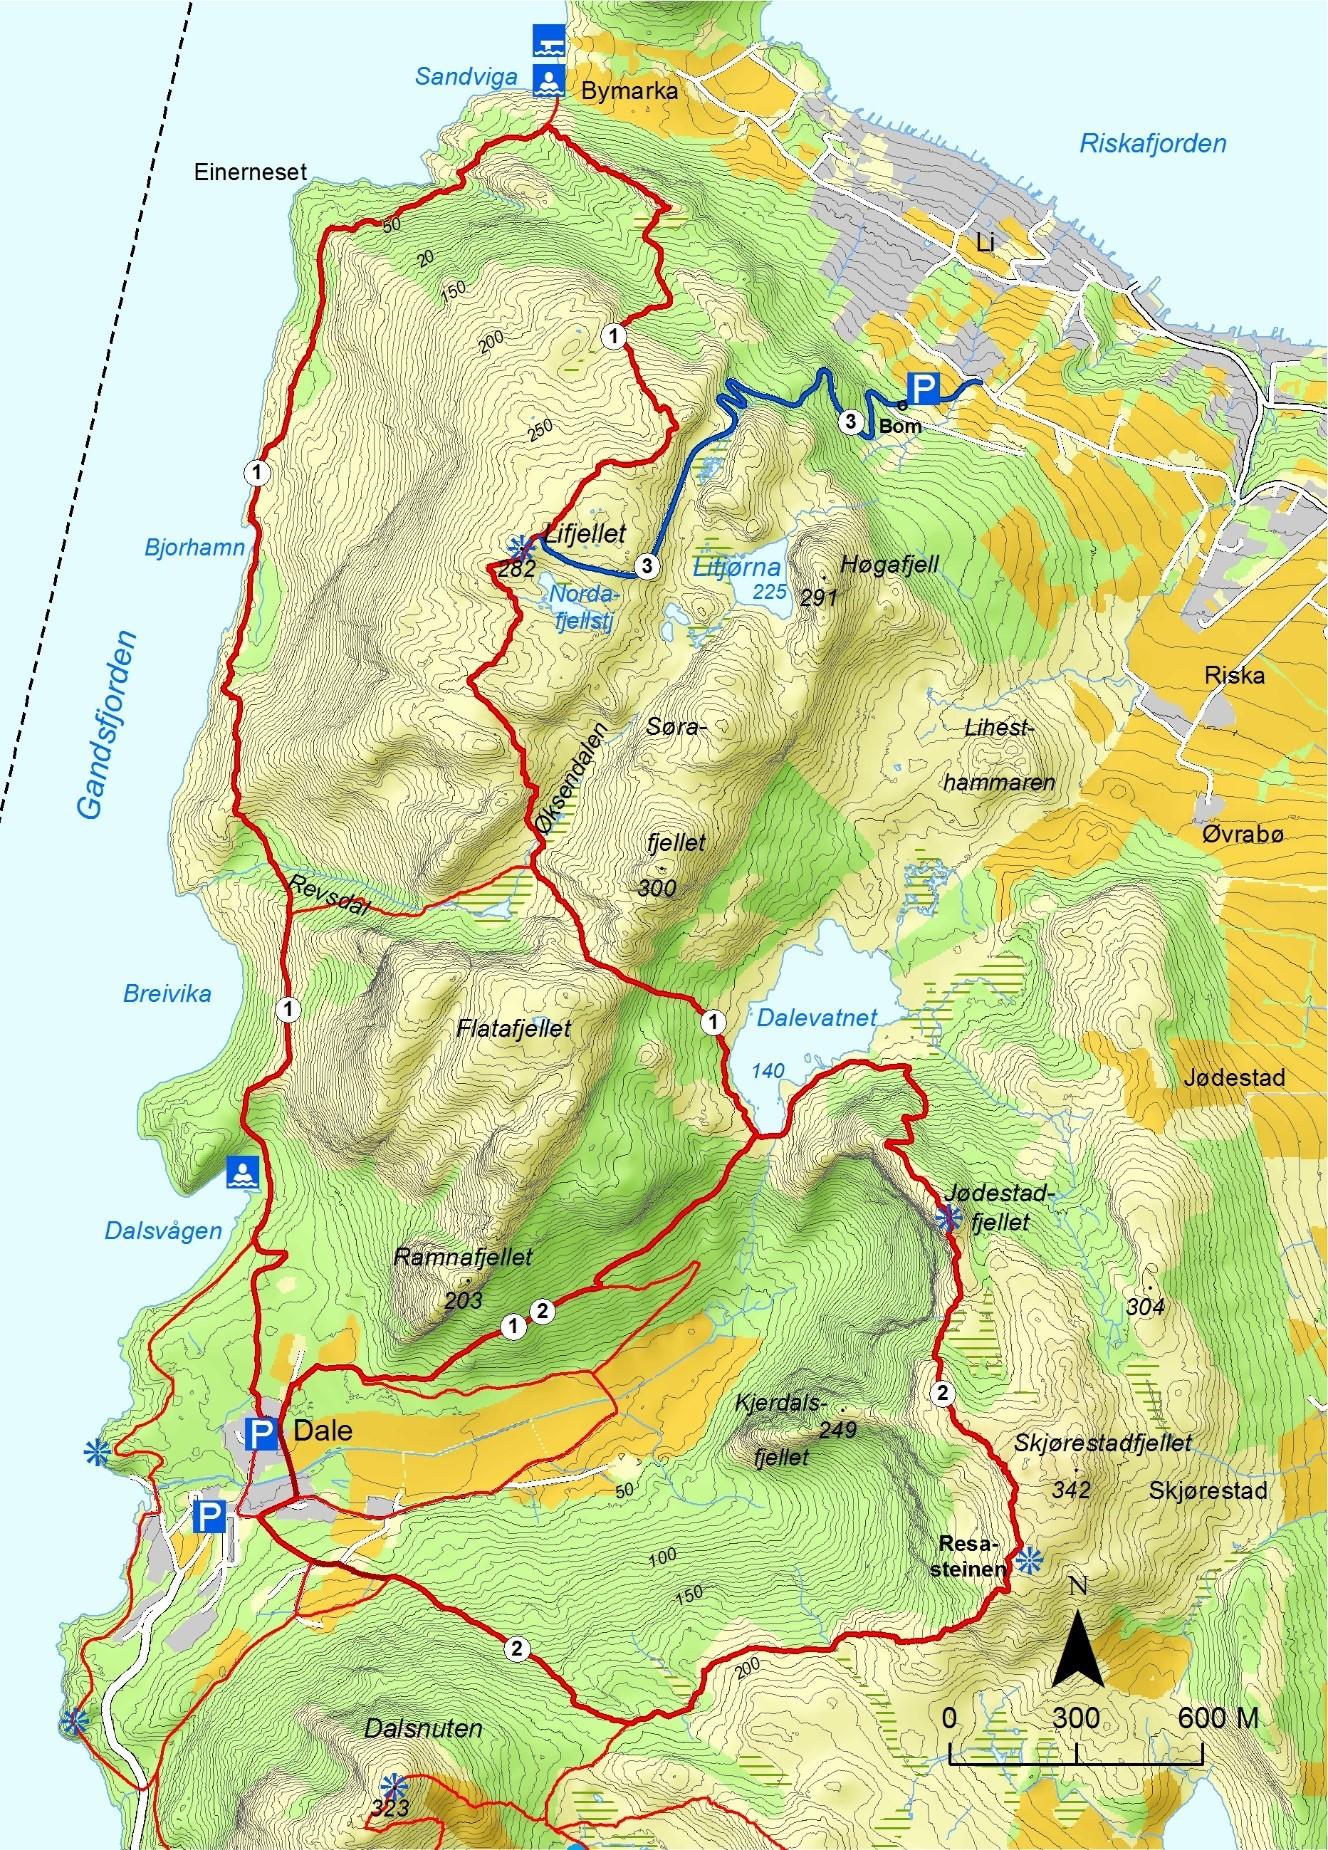 sandvedparken kart Sandnes kommune   Turmuligheter sandvedparken kart